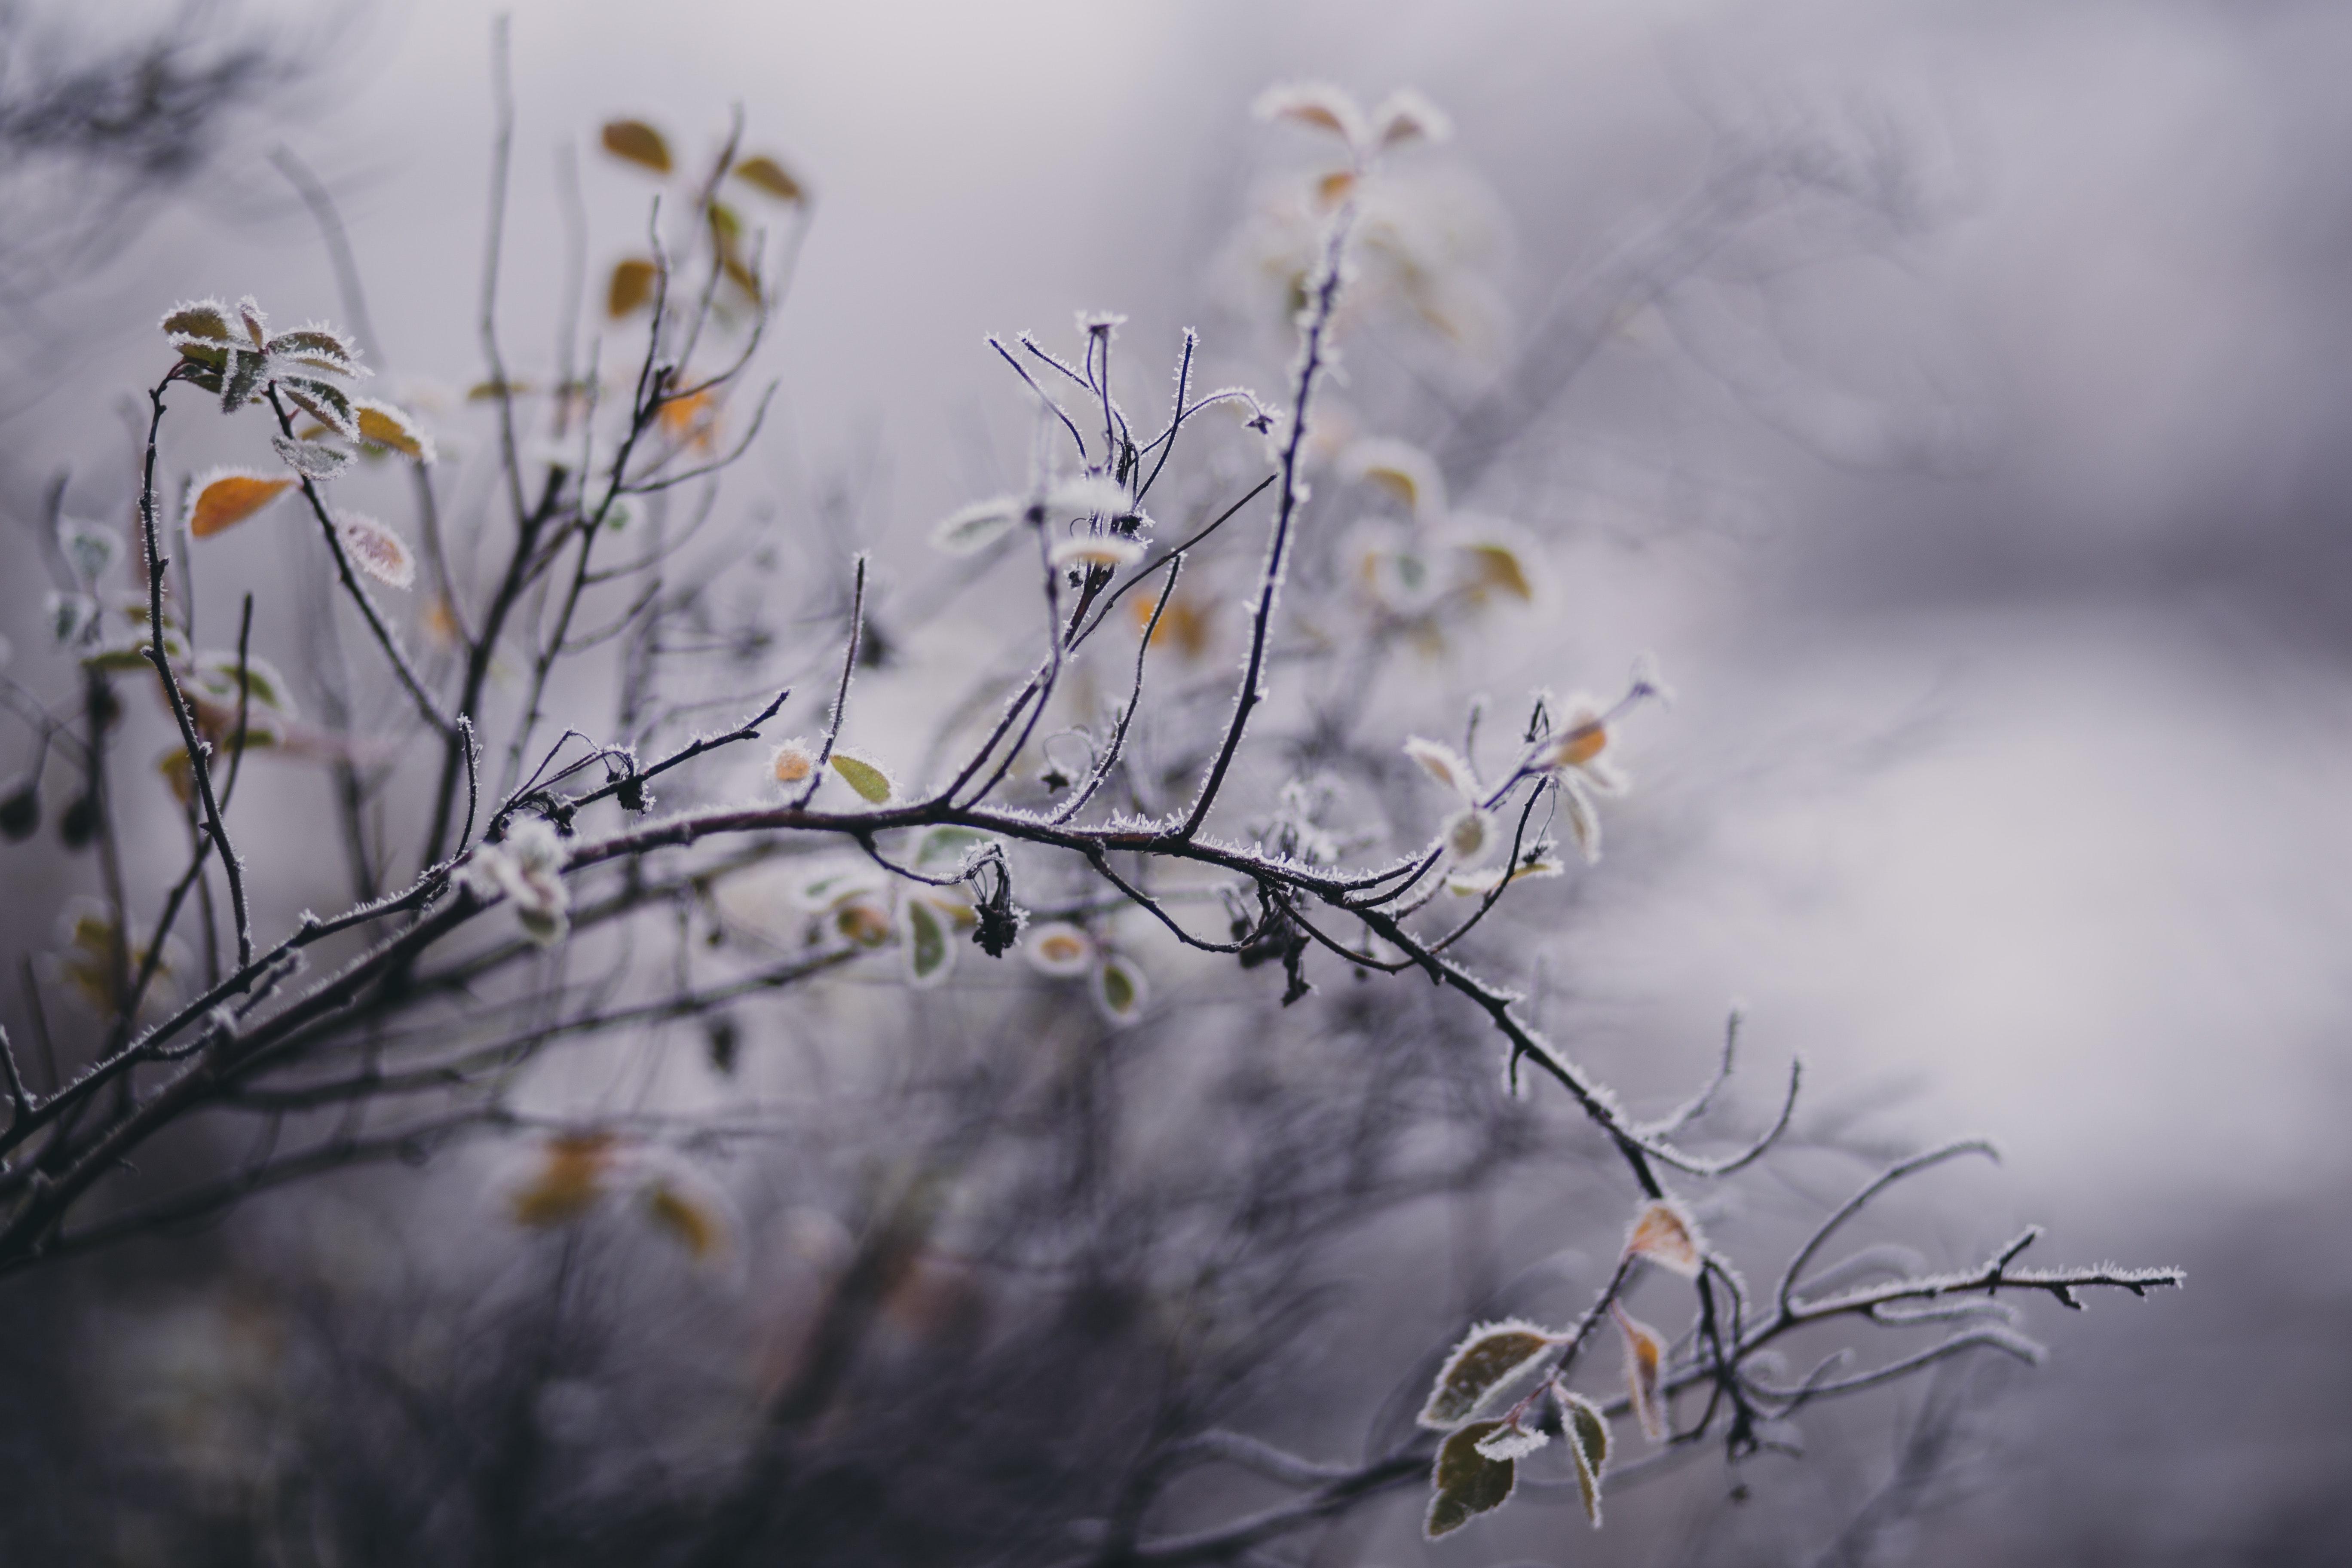 Tilt Shift Focus Photography of White Petaled Flower, Blurred background, Landscape, Weather, Sunlight, HQ Photo